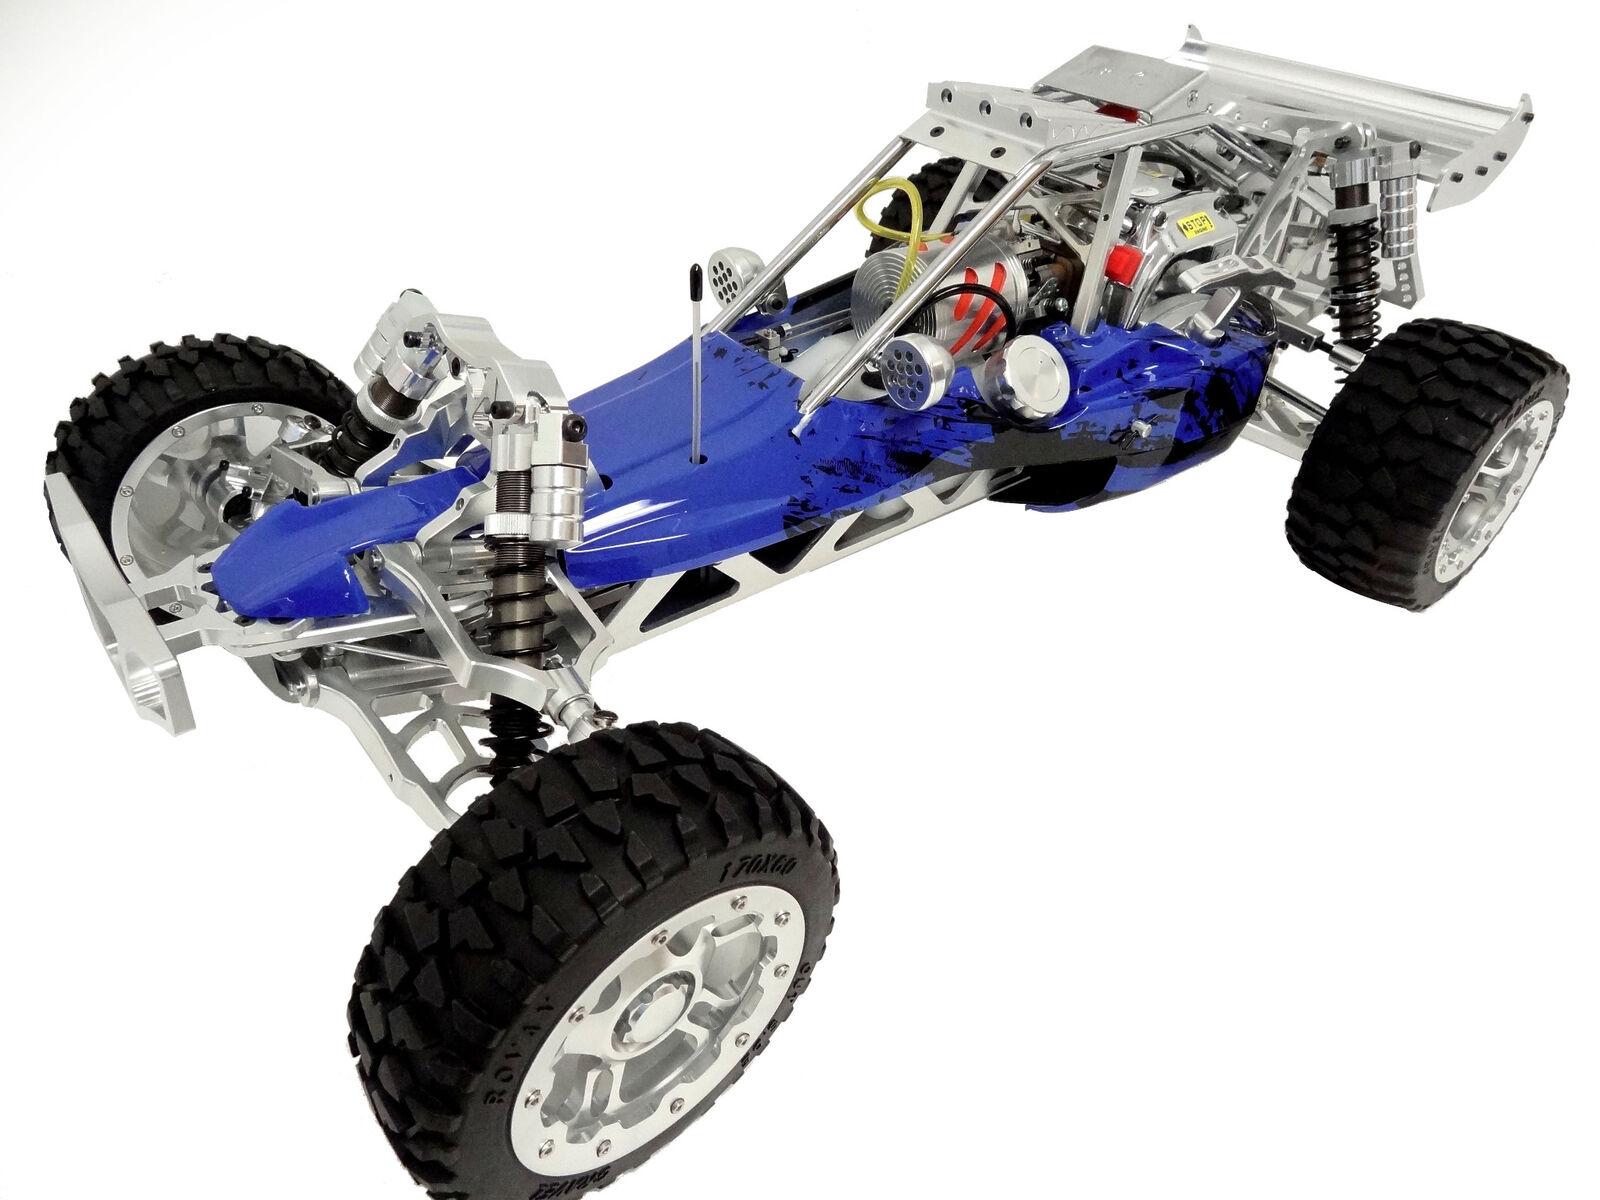 Rovan 1 5 36cc 320B Full Aluminum Gas energiaosso Baja  re Motor HPI 5B Compatible  negozio online outlet